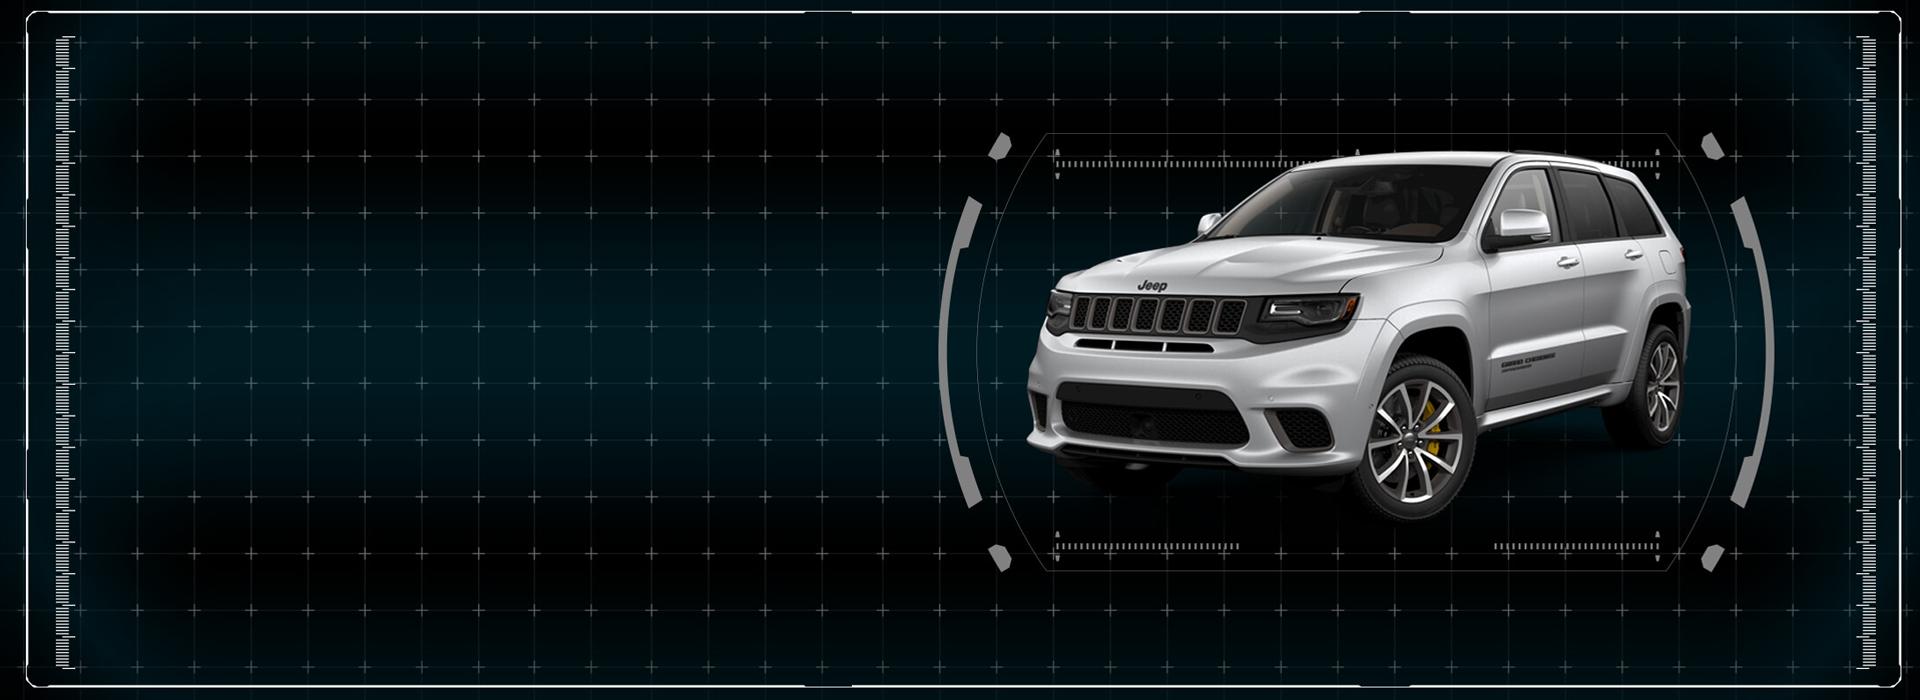 Jeep Australia Official Site Explore Our Suv Range 13 Grand Cherokee Wj Wrangler Patriot Trackhawk New Homepage